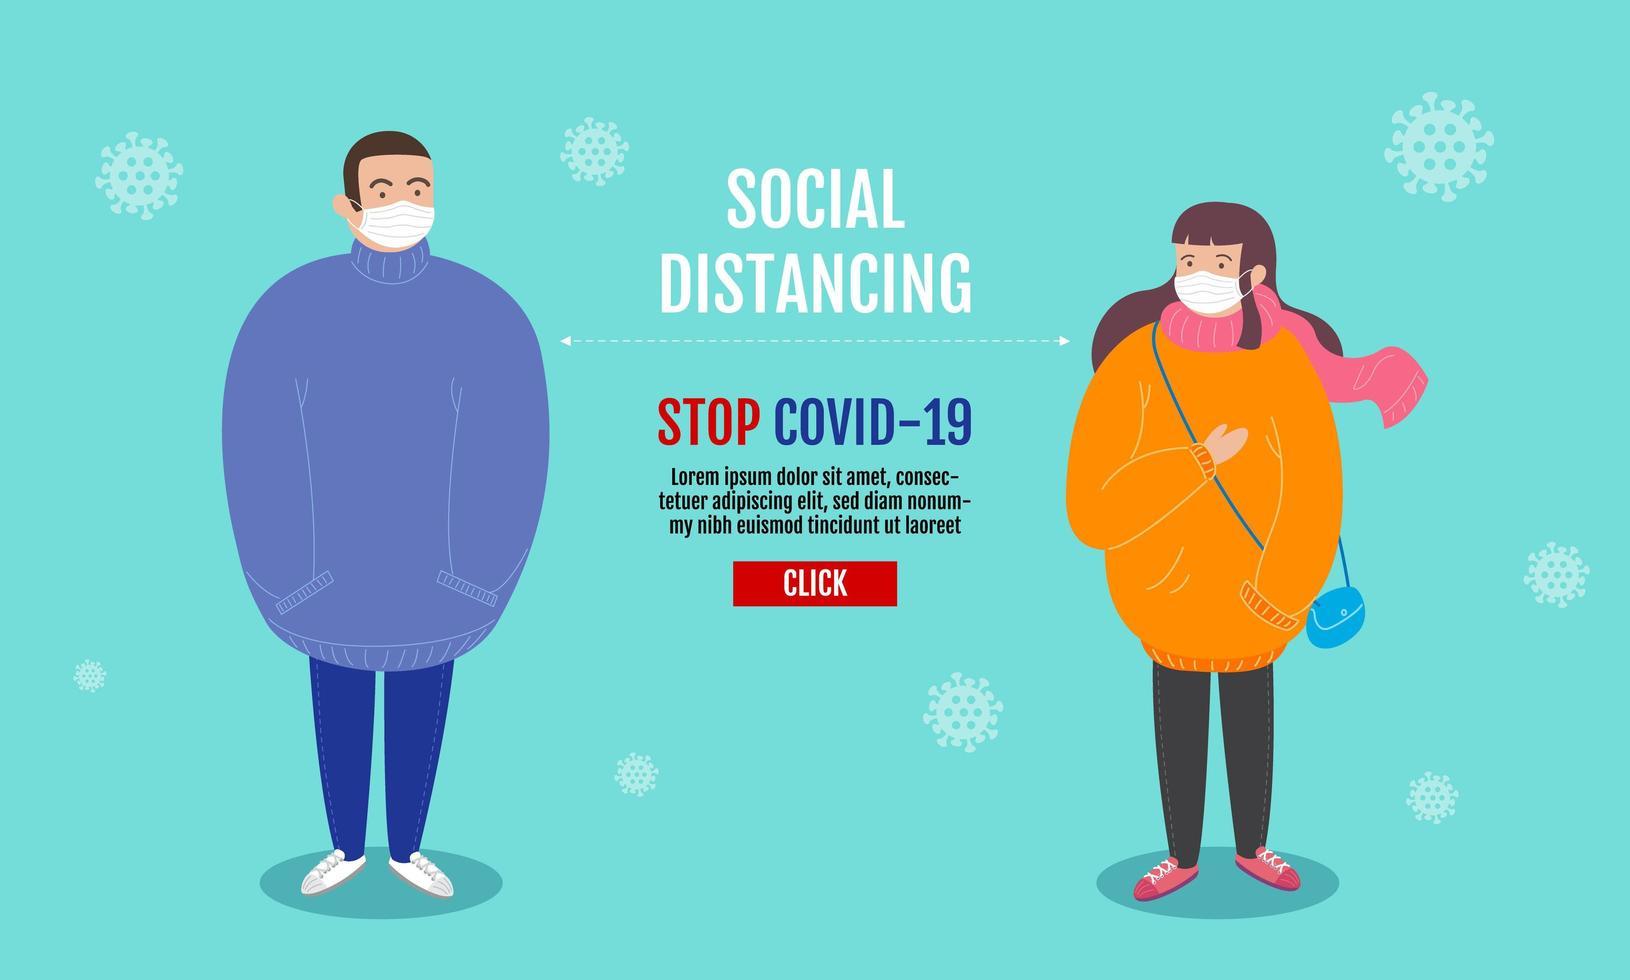 página de destino para distanciamento social vetor